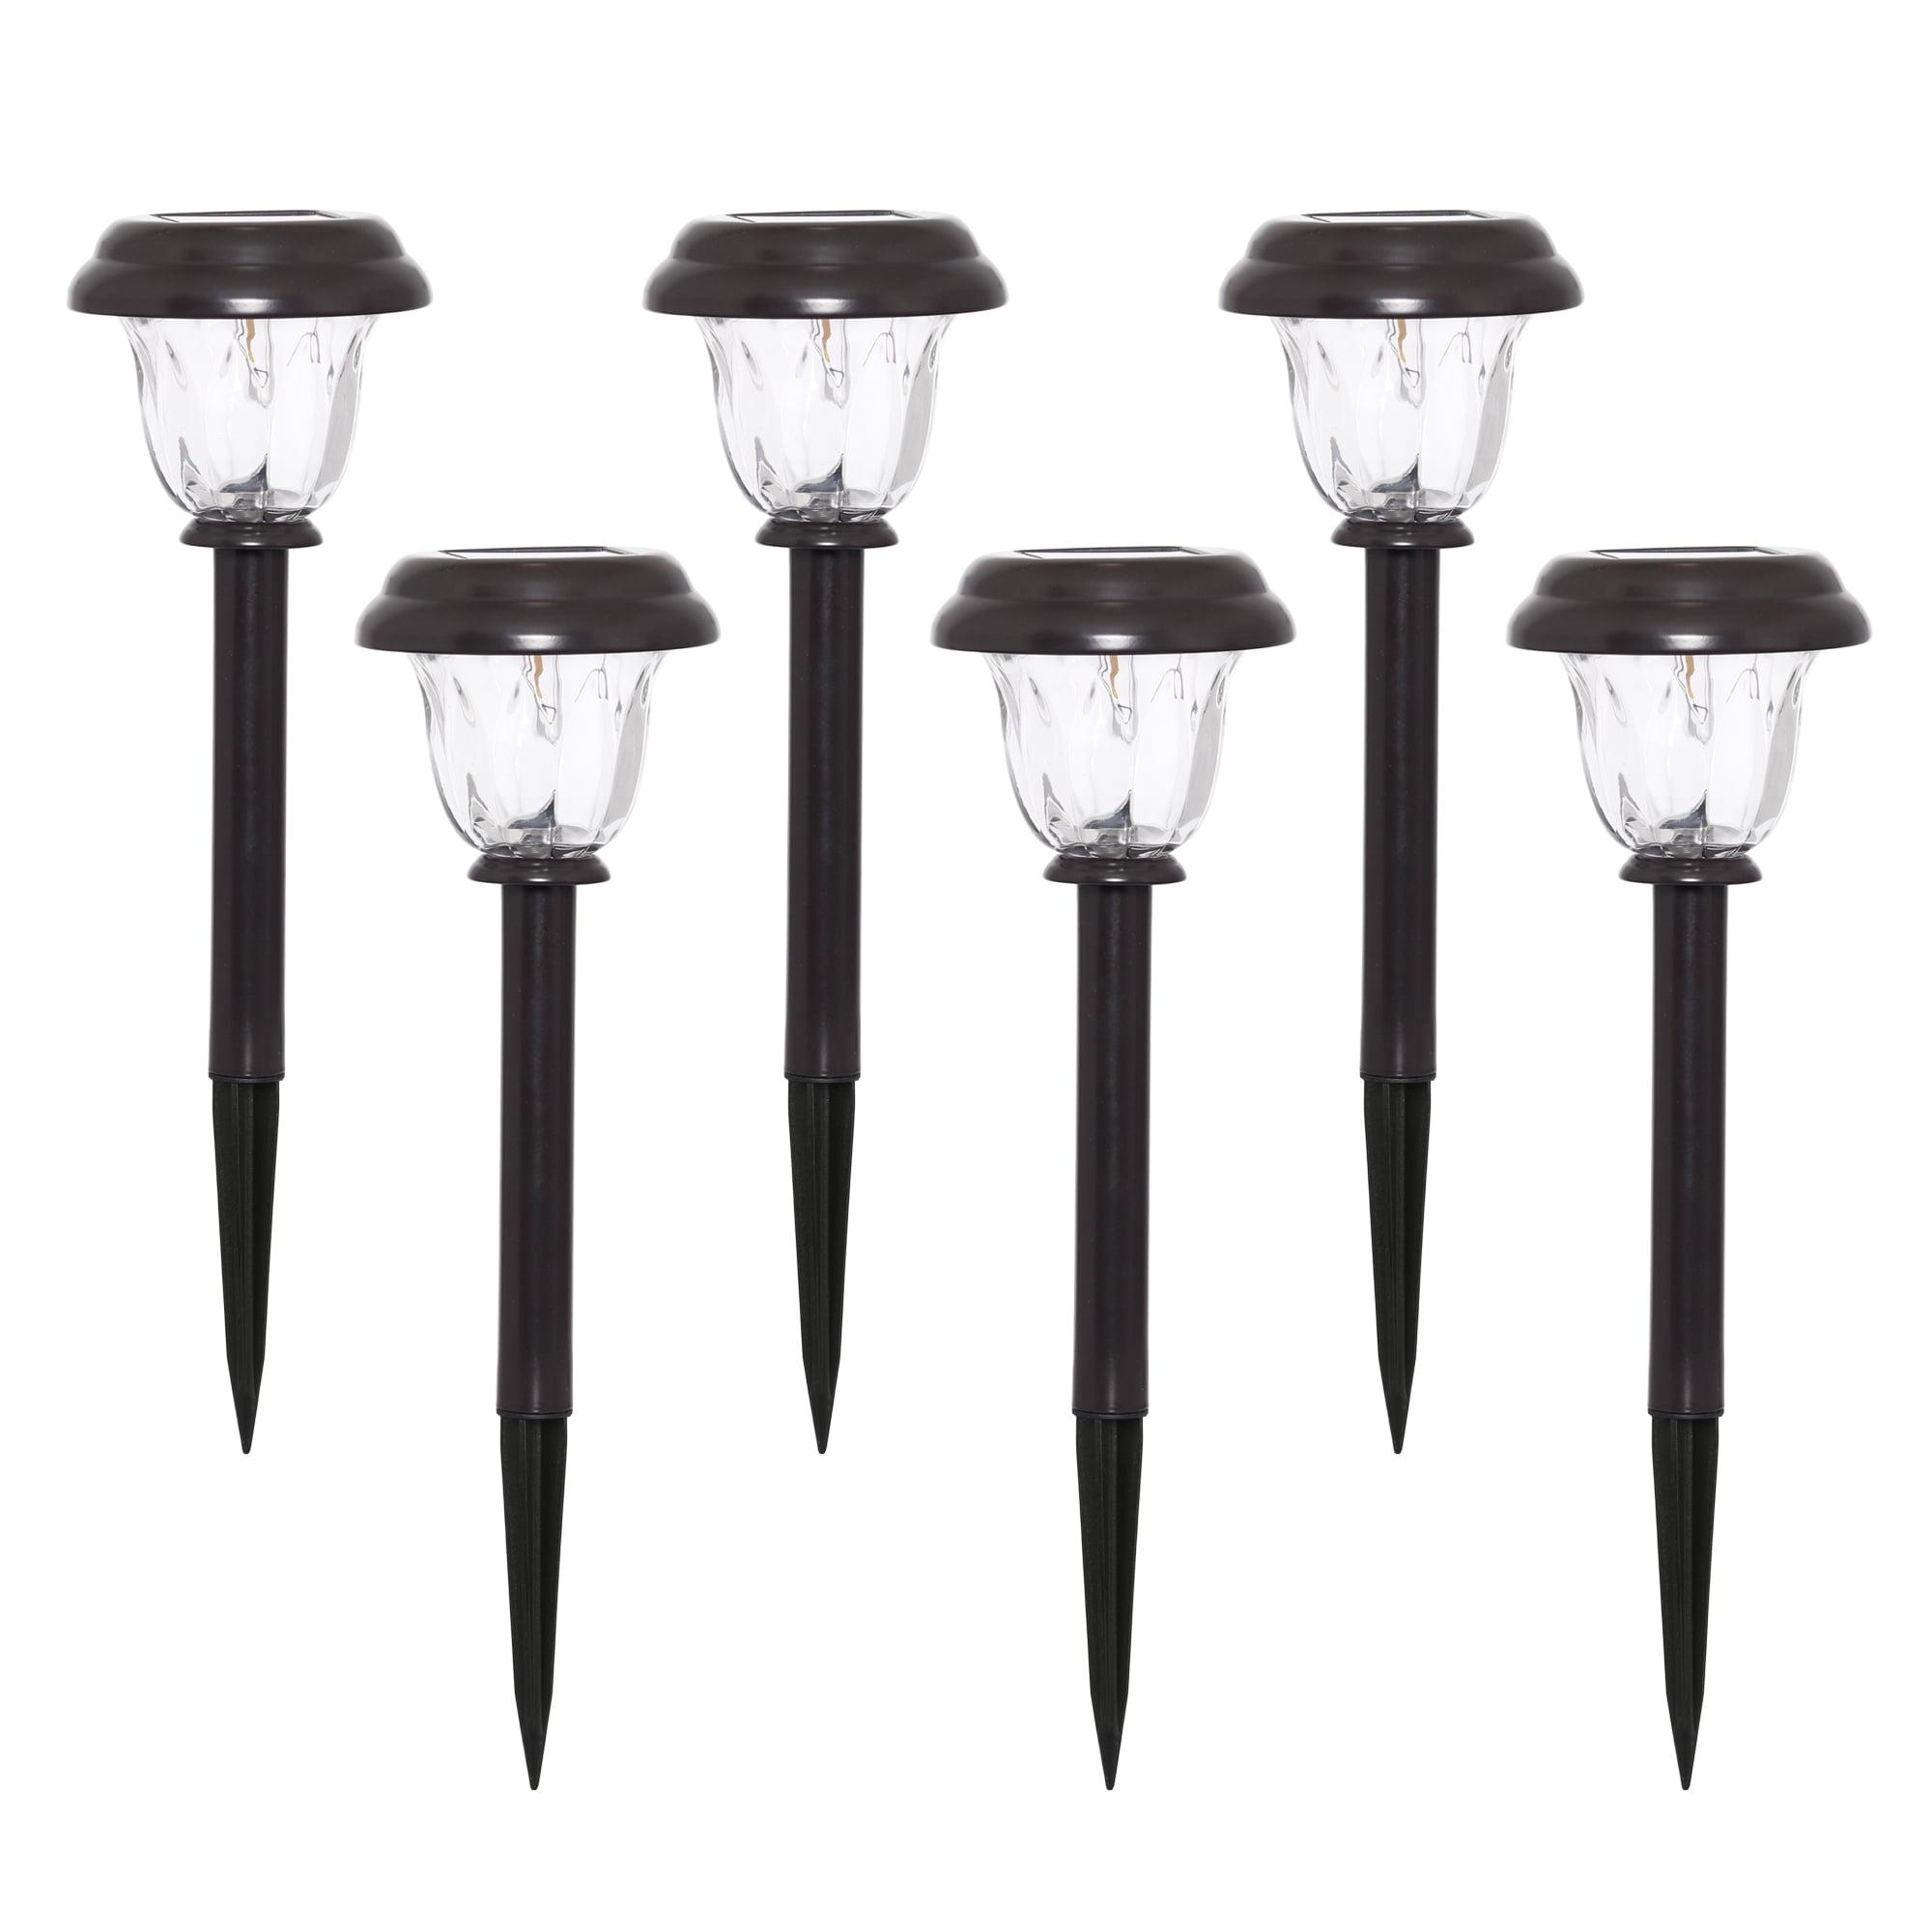 Deluxe Aluminum 6.5 FT Tall Landscape Solar Post Lights 4 LEDs Lamp Traditonal